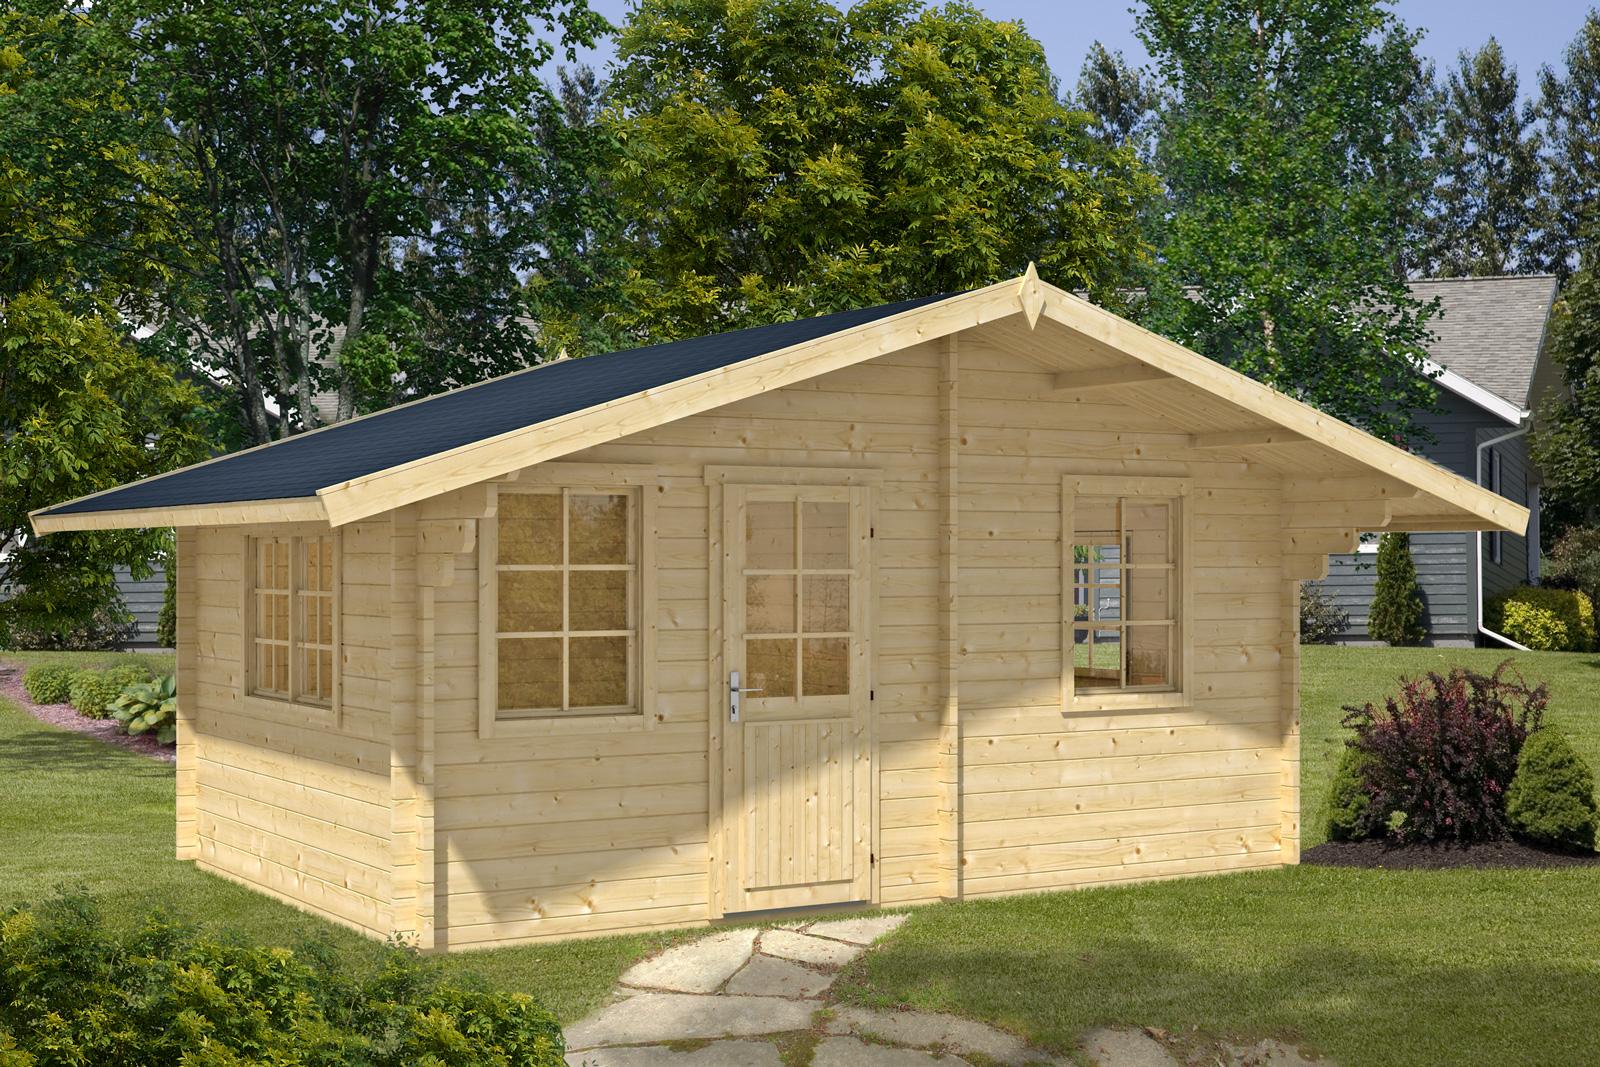 2 raum gartenhaus modell susanna 44 iso. Black Bedroom Furniture Sets. Home Design Ideas